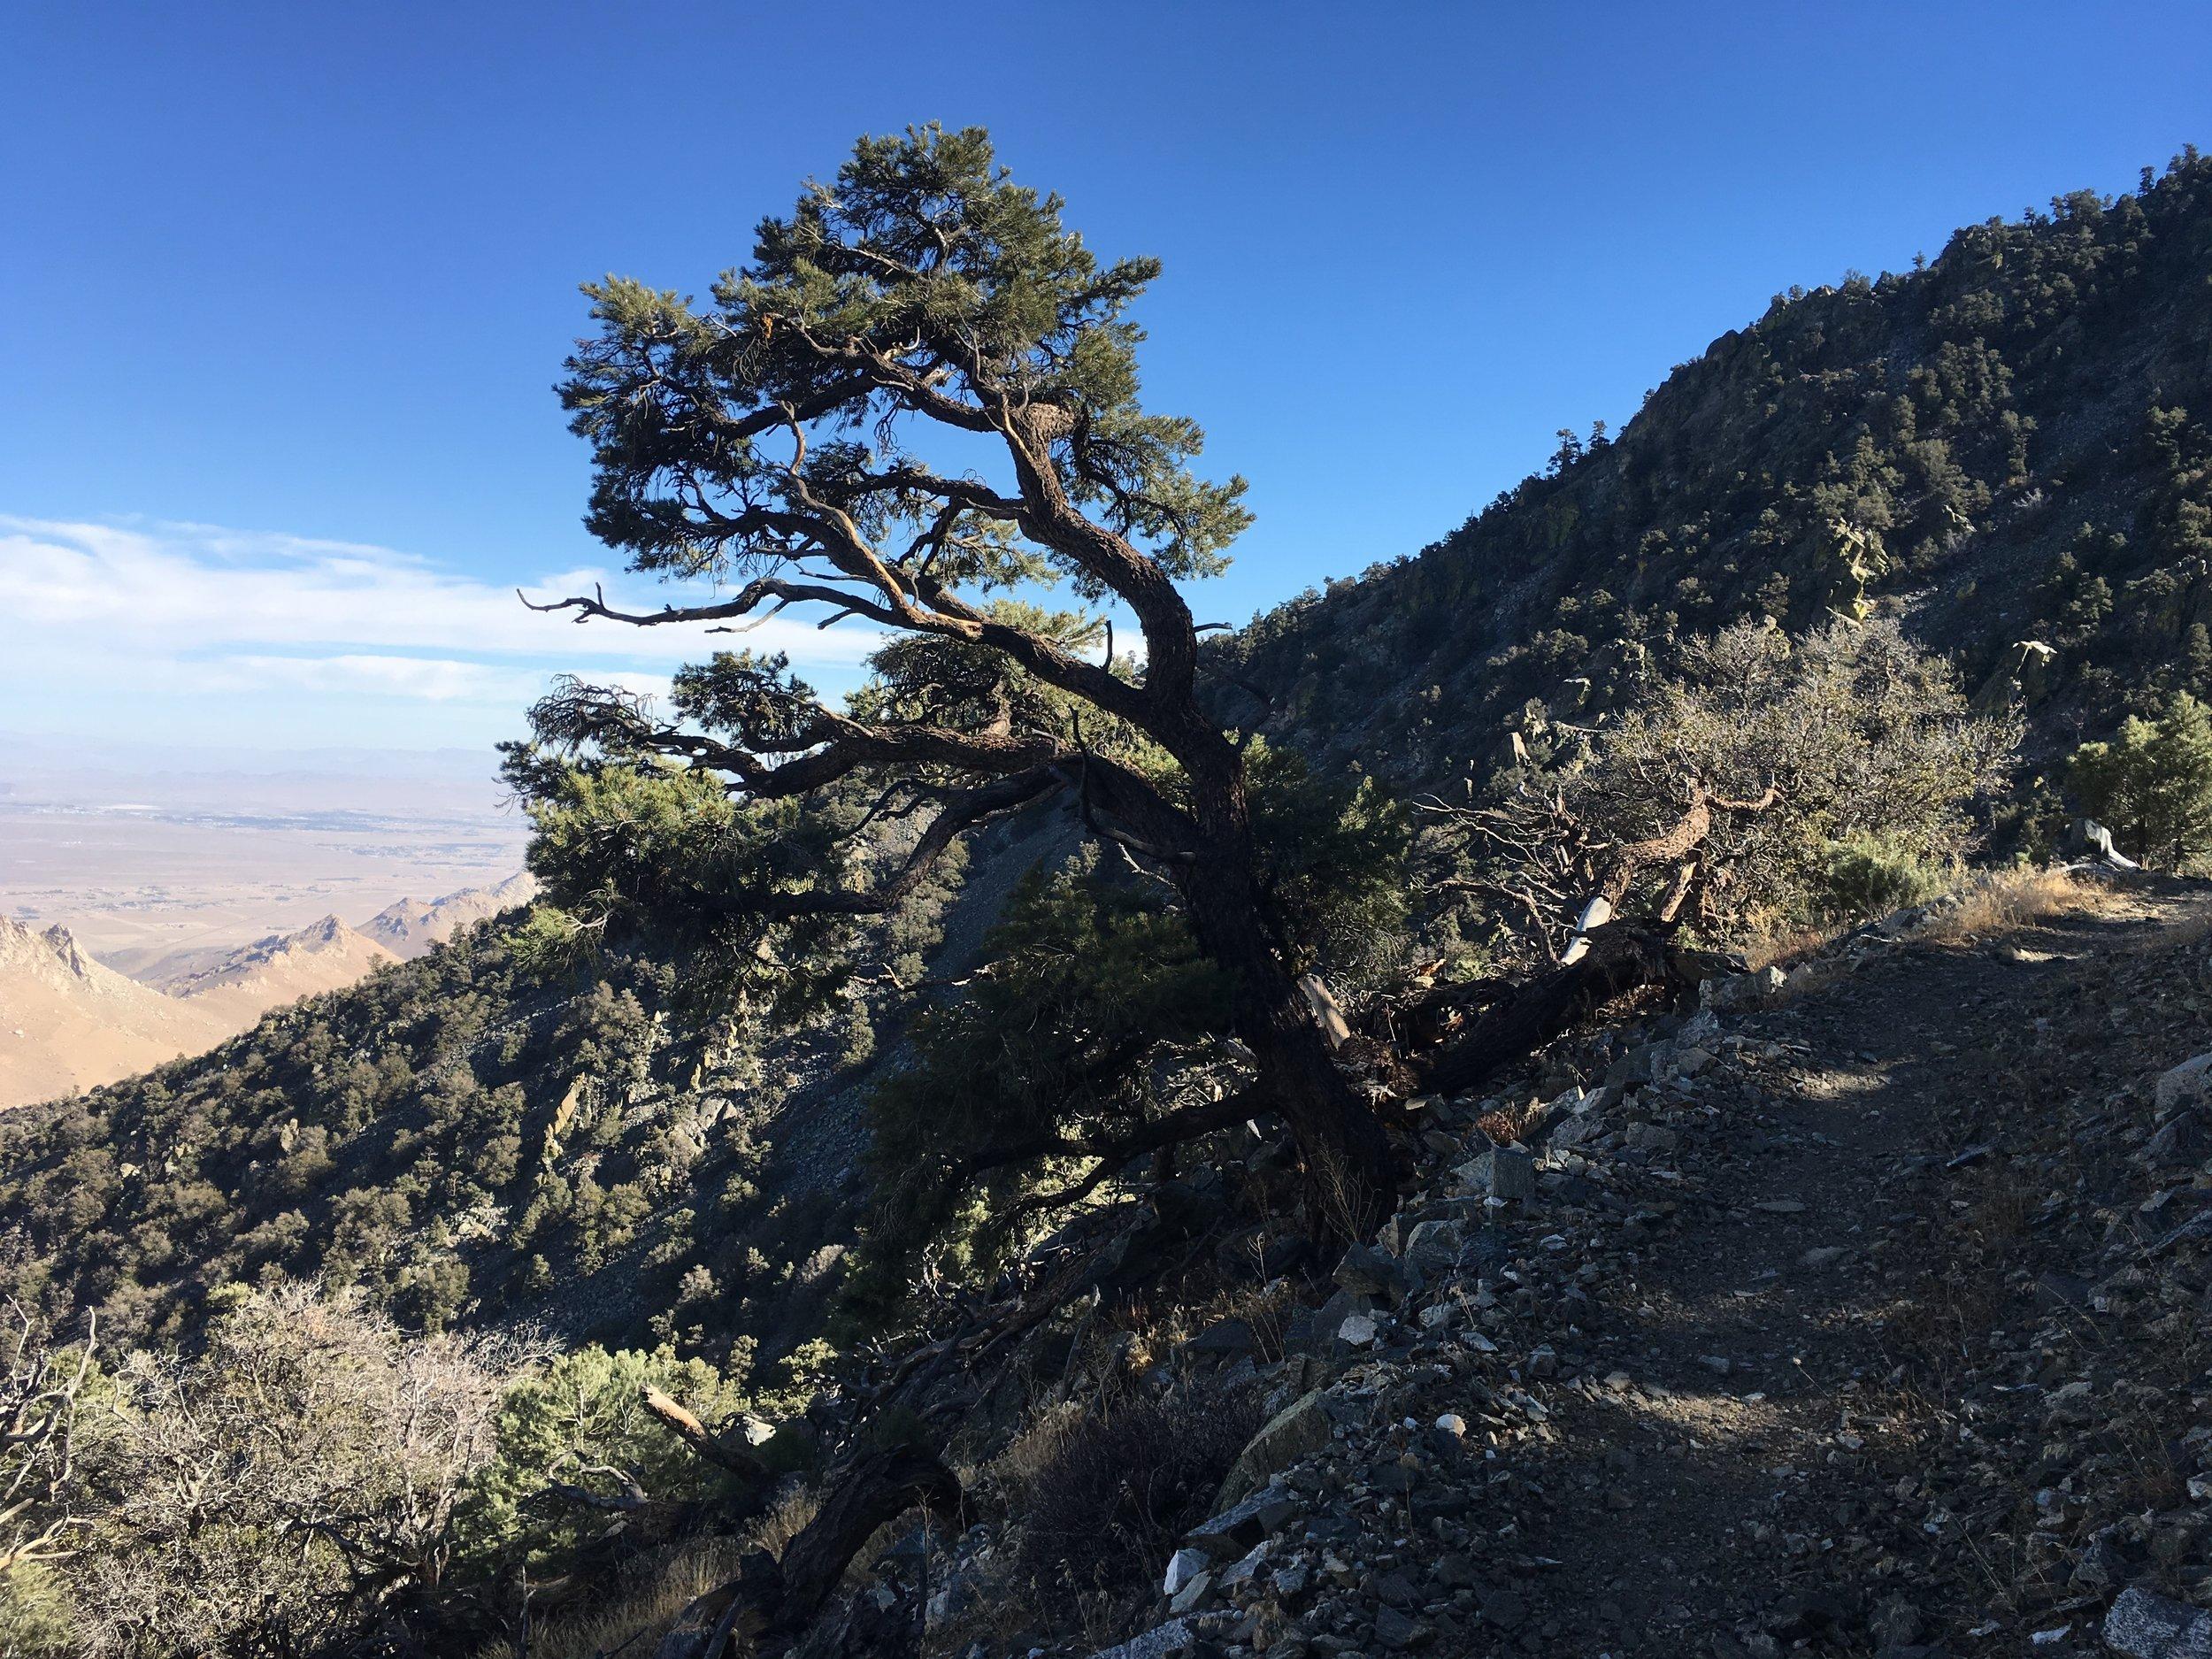 Windswept Pinyon pine on the edge of the desert.